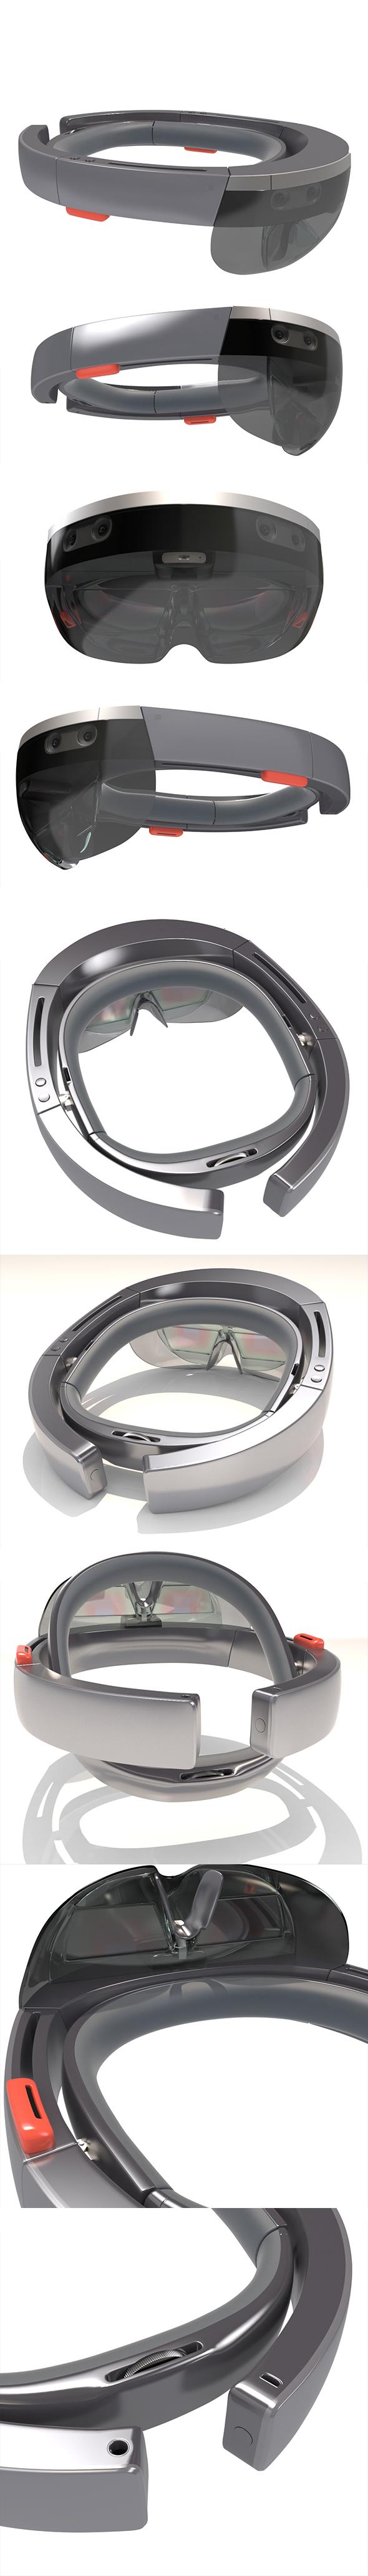 Hololens Microsoft 3D model - 3DOcean Item for Sale